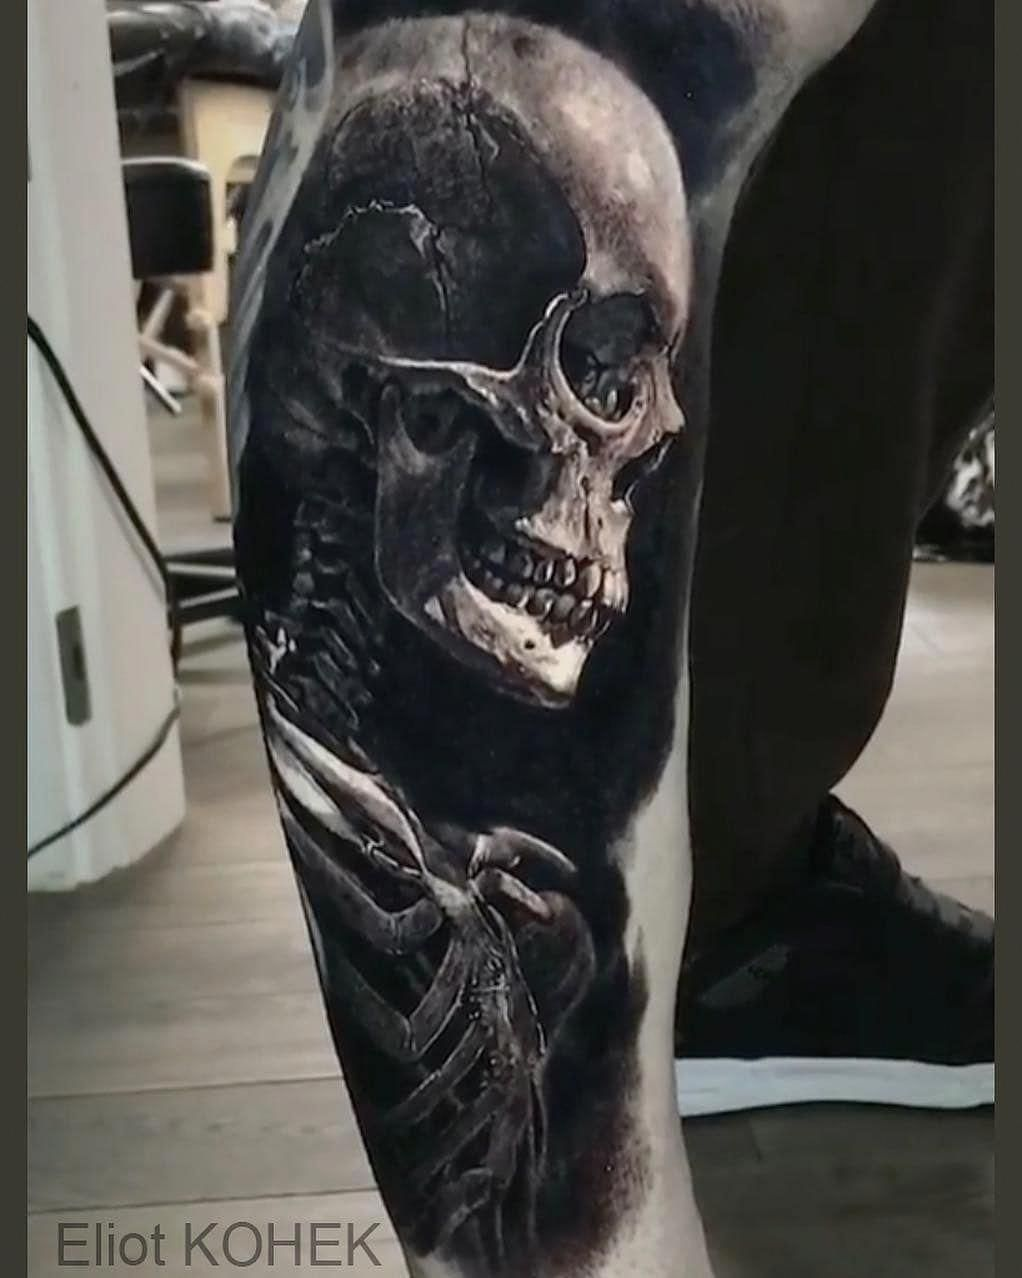 1a5bfe7c3 Tattoo done by @eliot.kohek member of @overkame_tattoo Tattoo sponsor  #Sleevetattoos